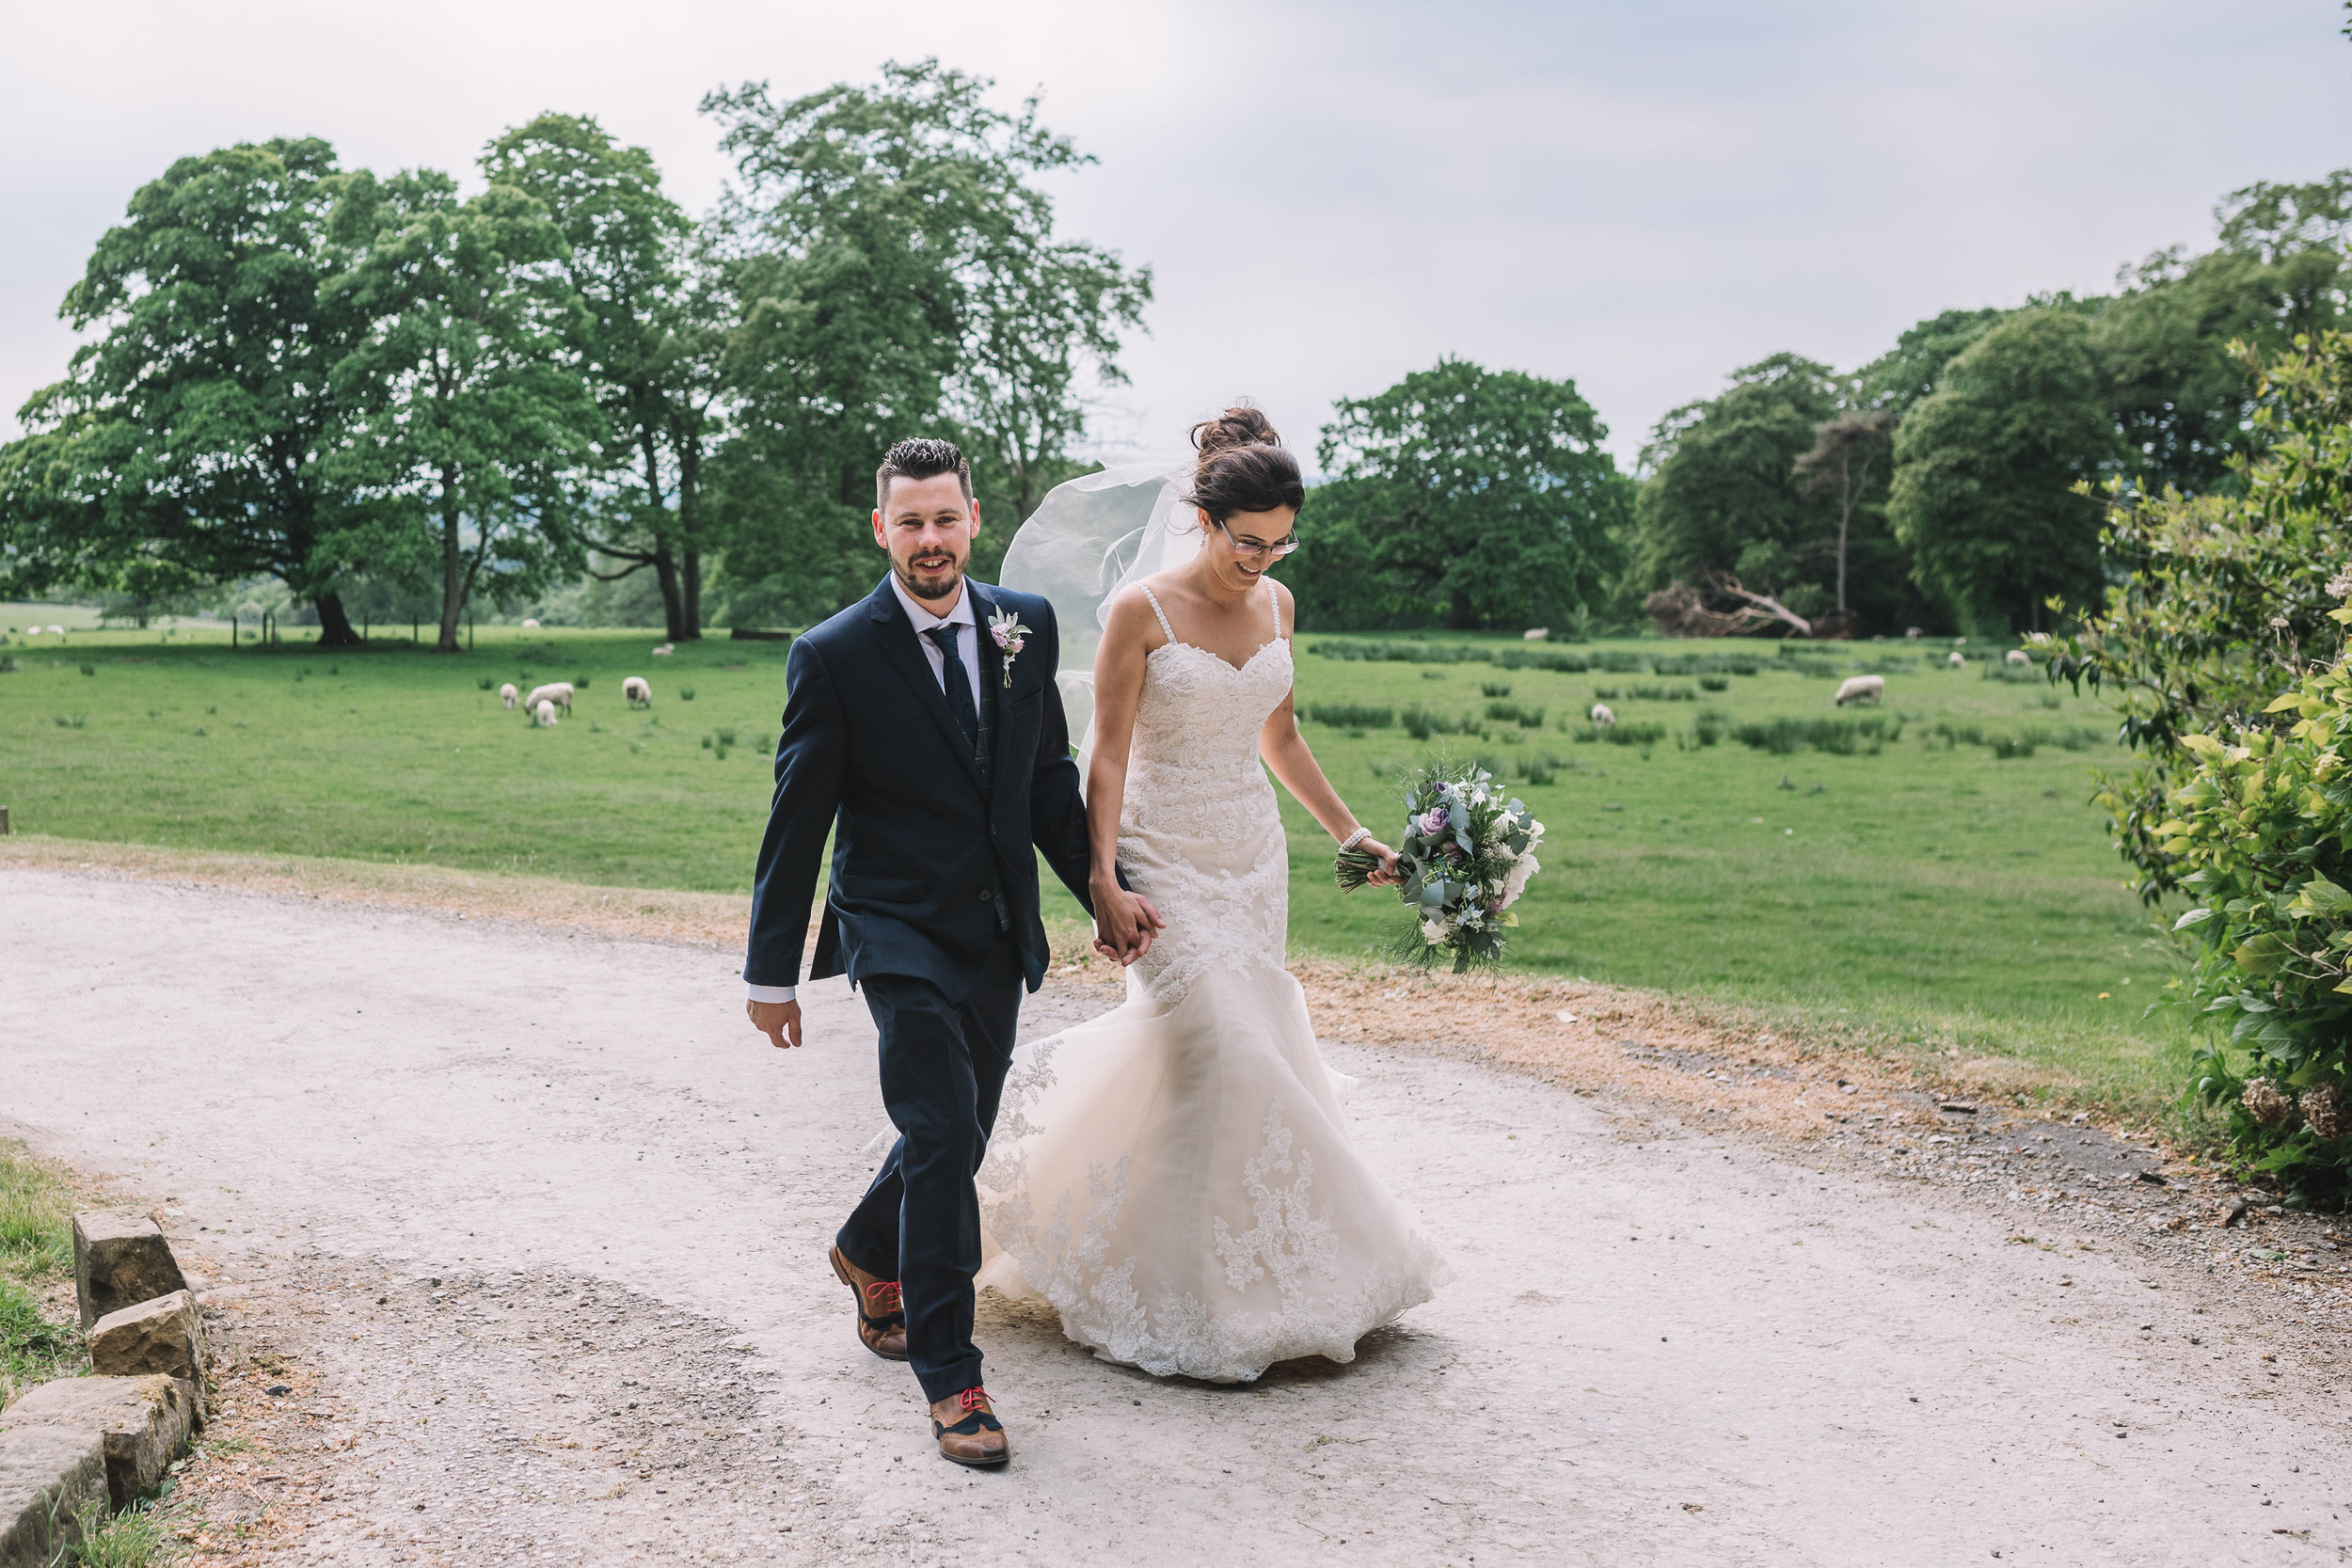 Contryside bride and groom walking